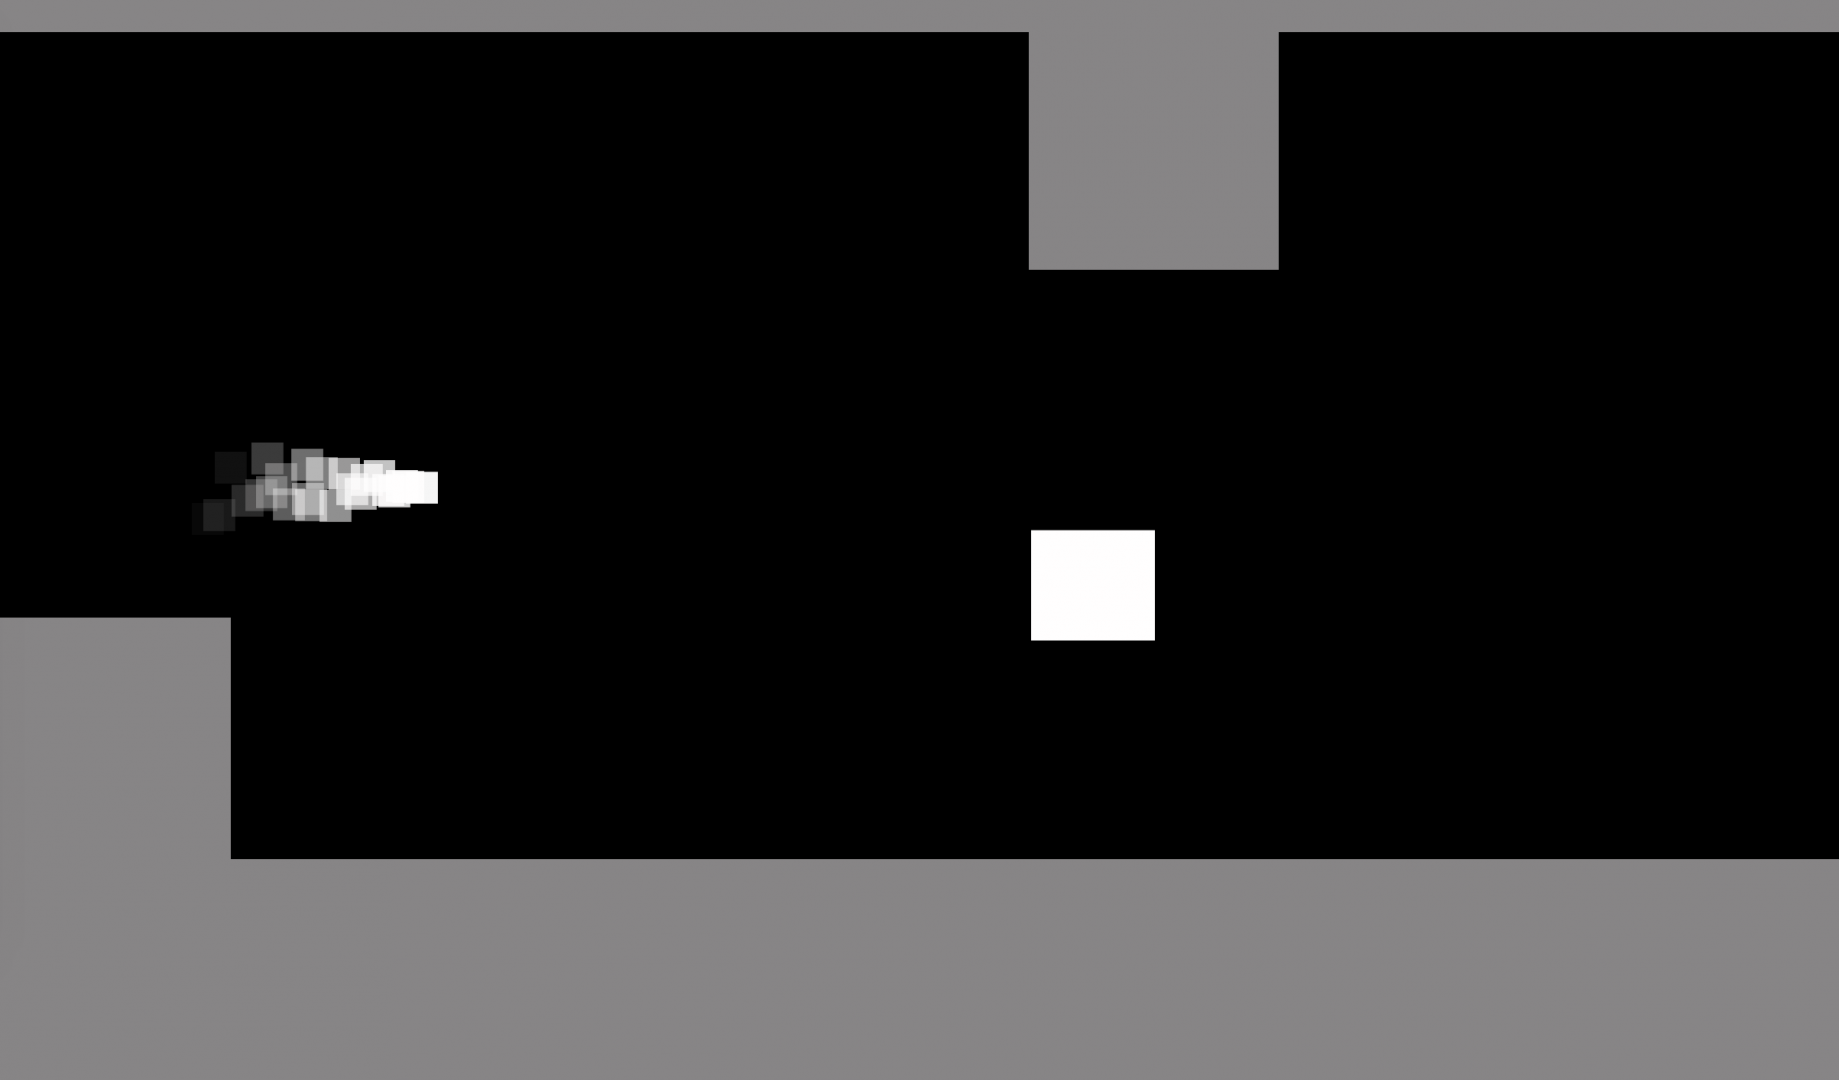 Screenshot 3 of Endless Runner playable.